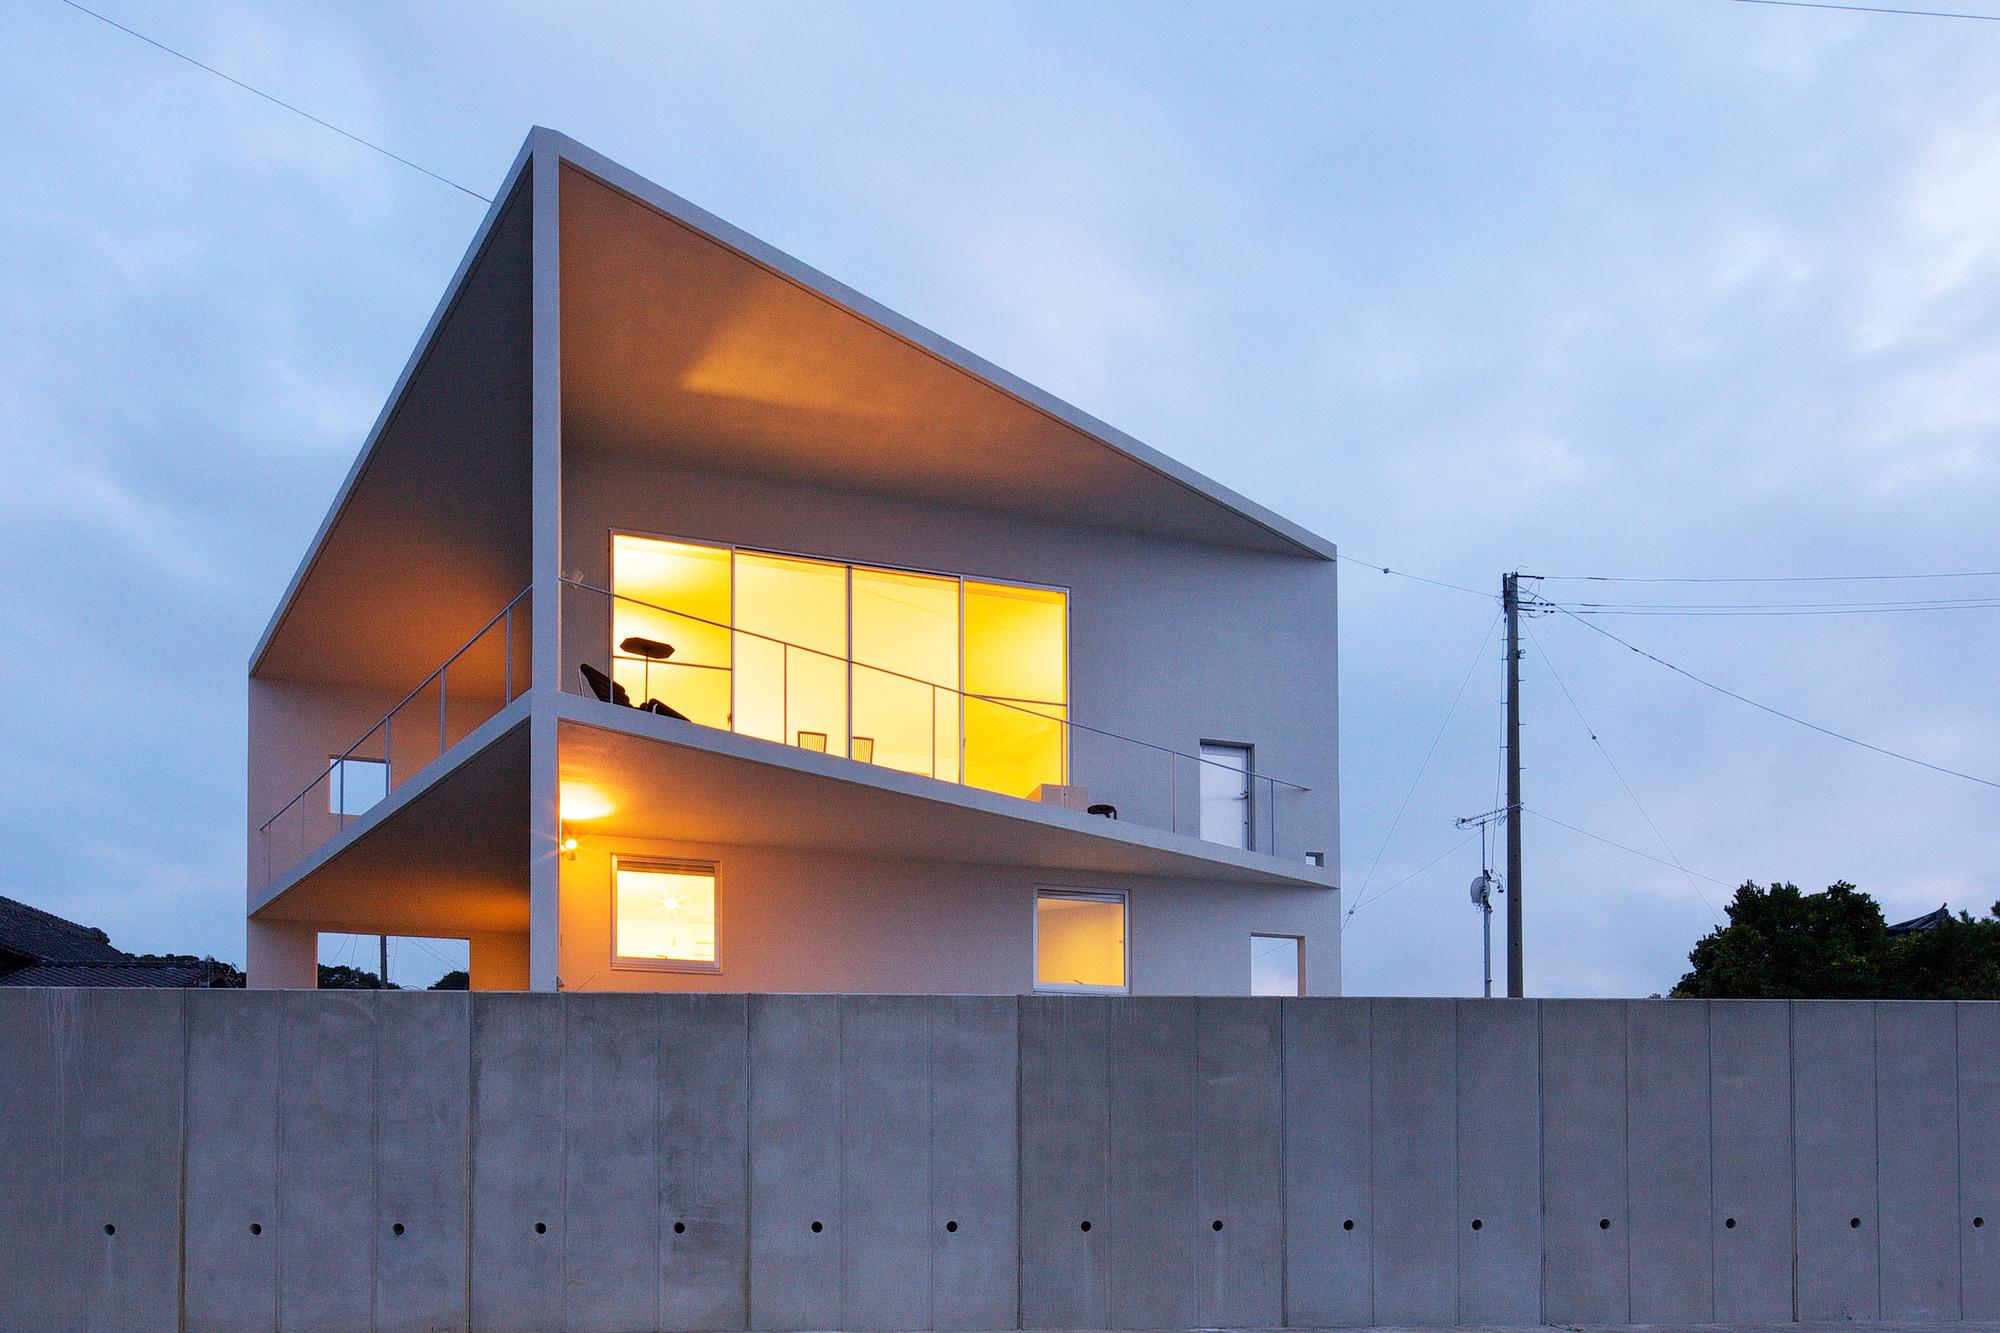 P2Villa Shinsyo / Szki Architects, © Katsuya Suzuki'